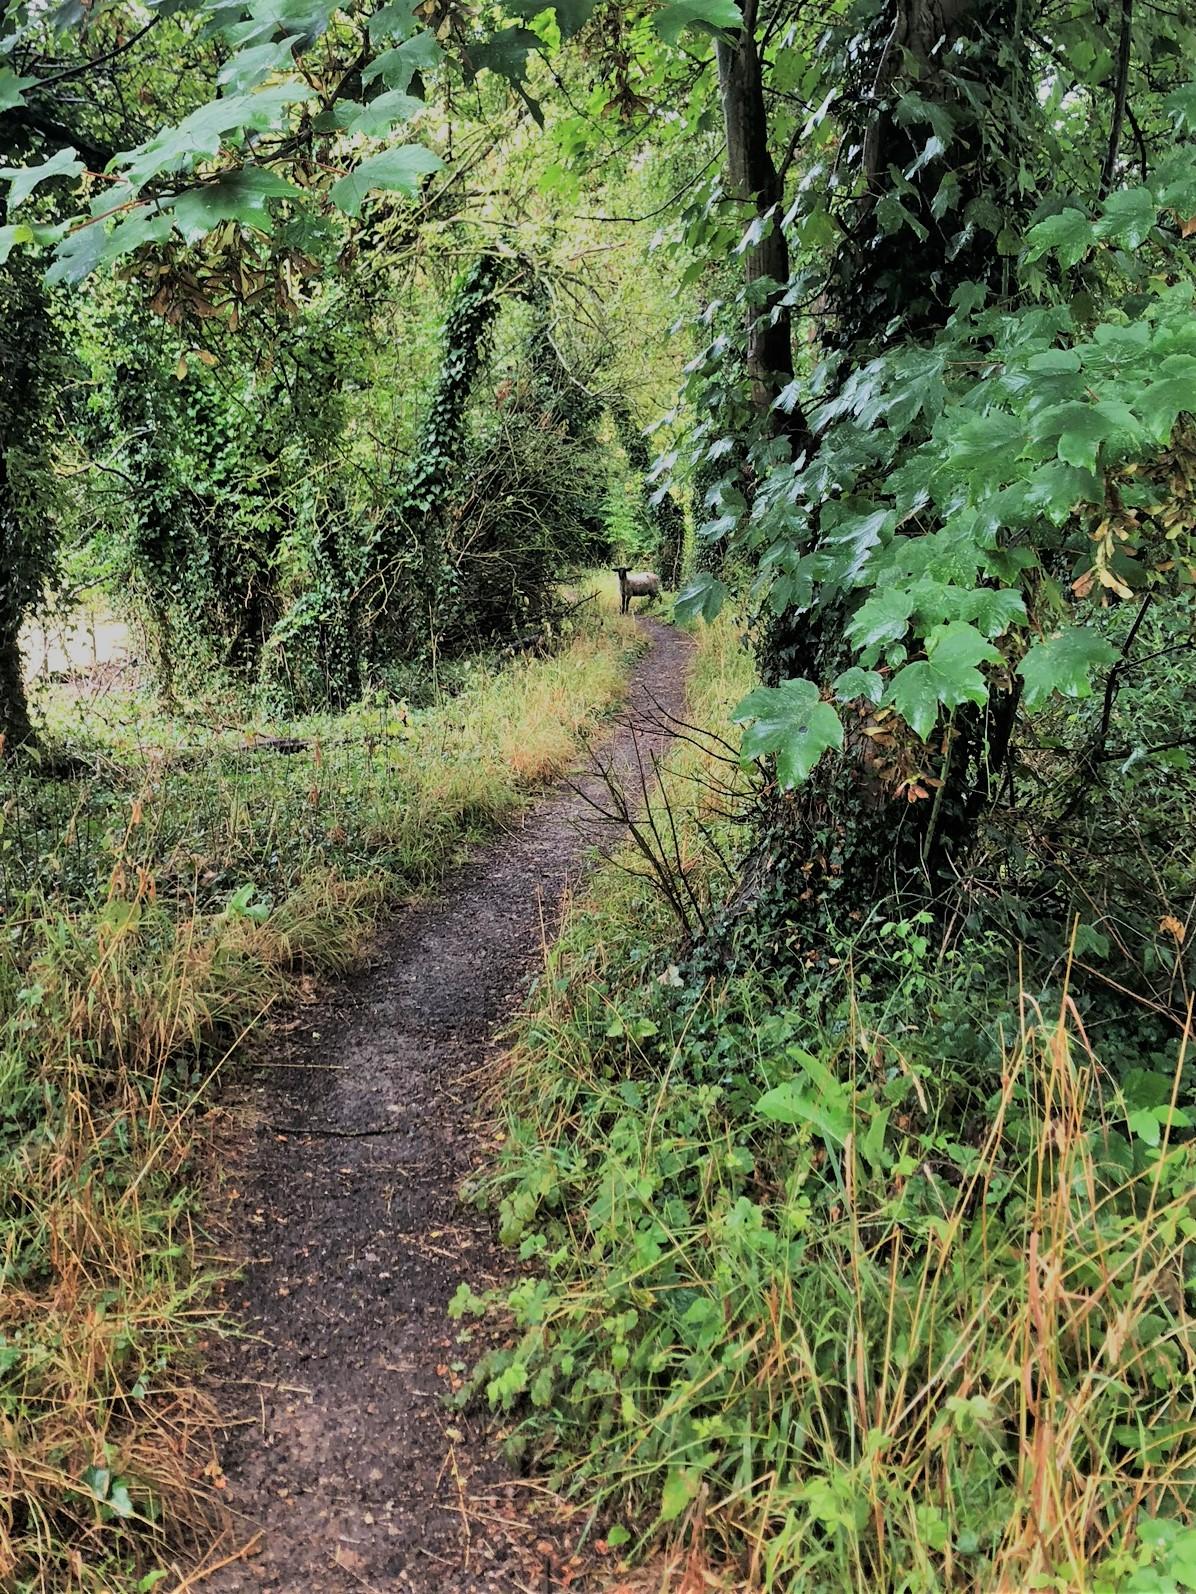 Trail Running - Mountain Need Not Apply